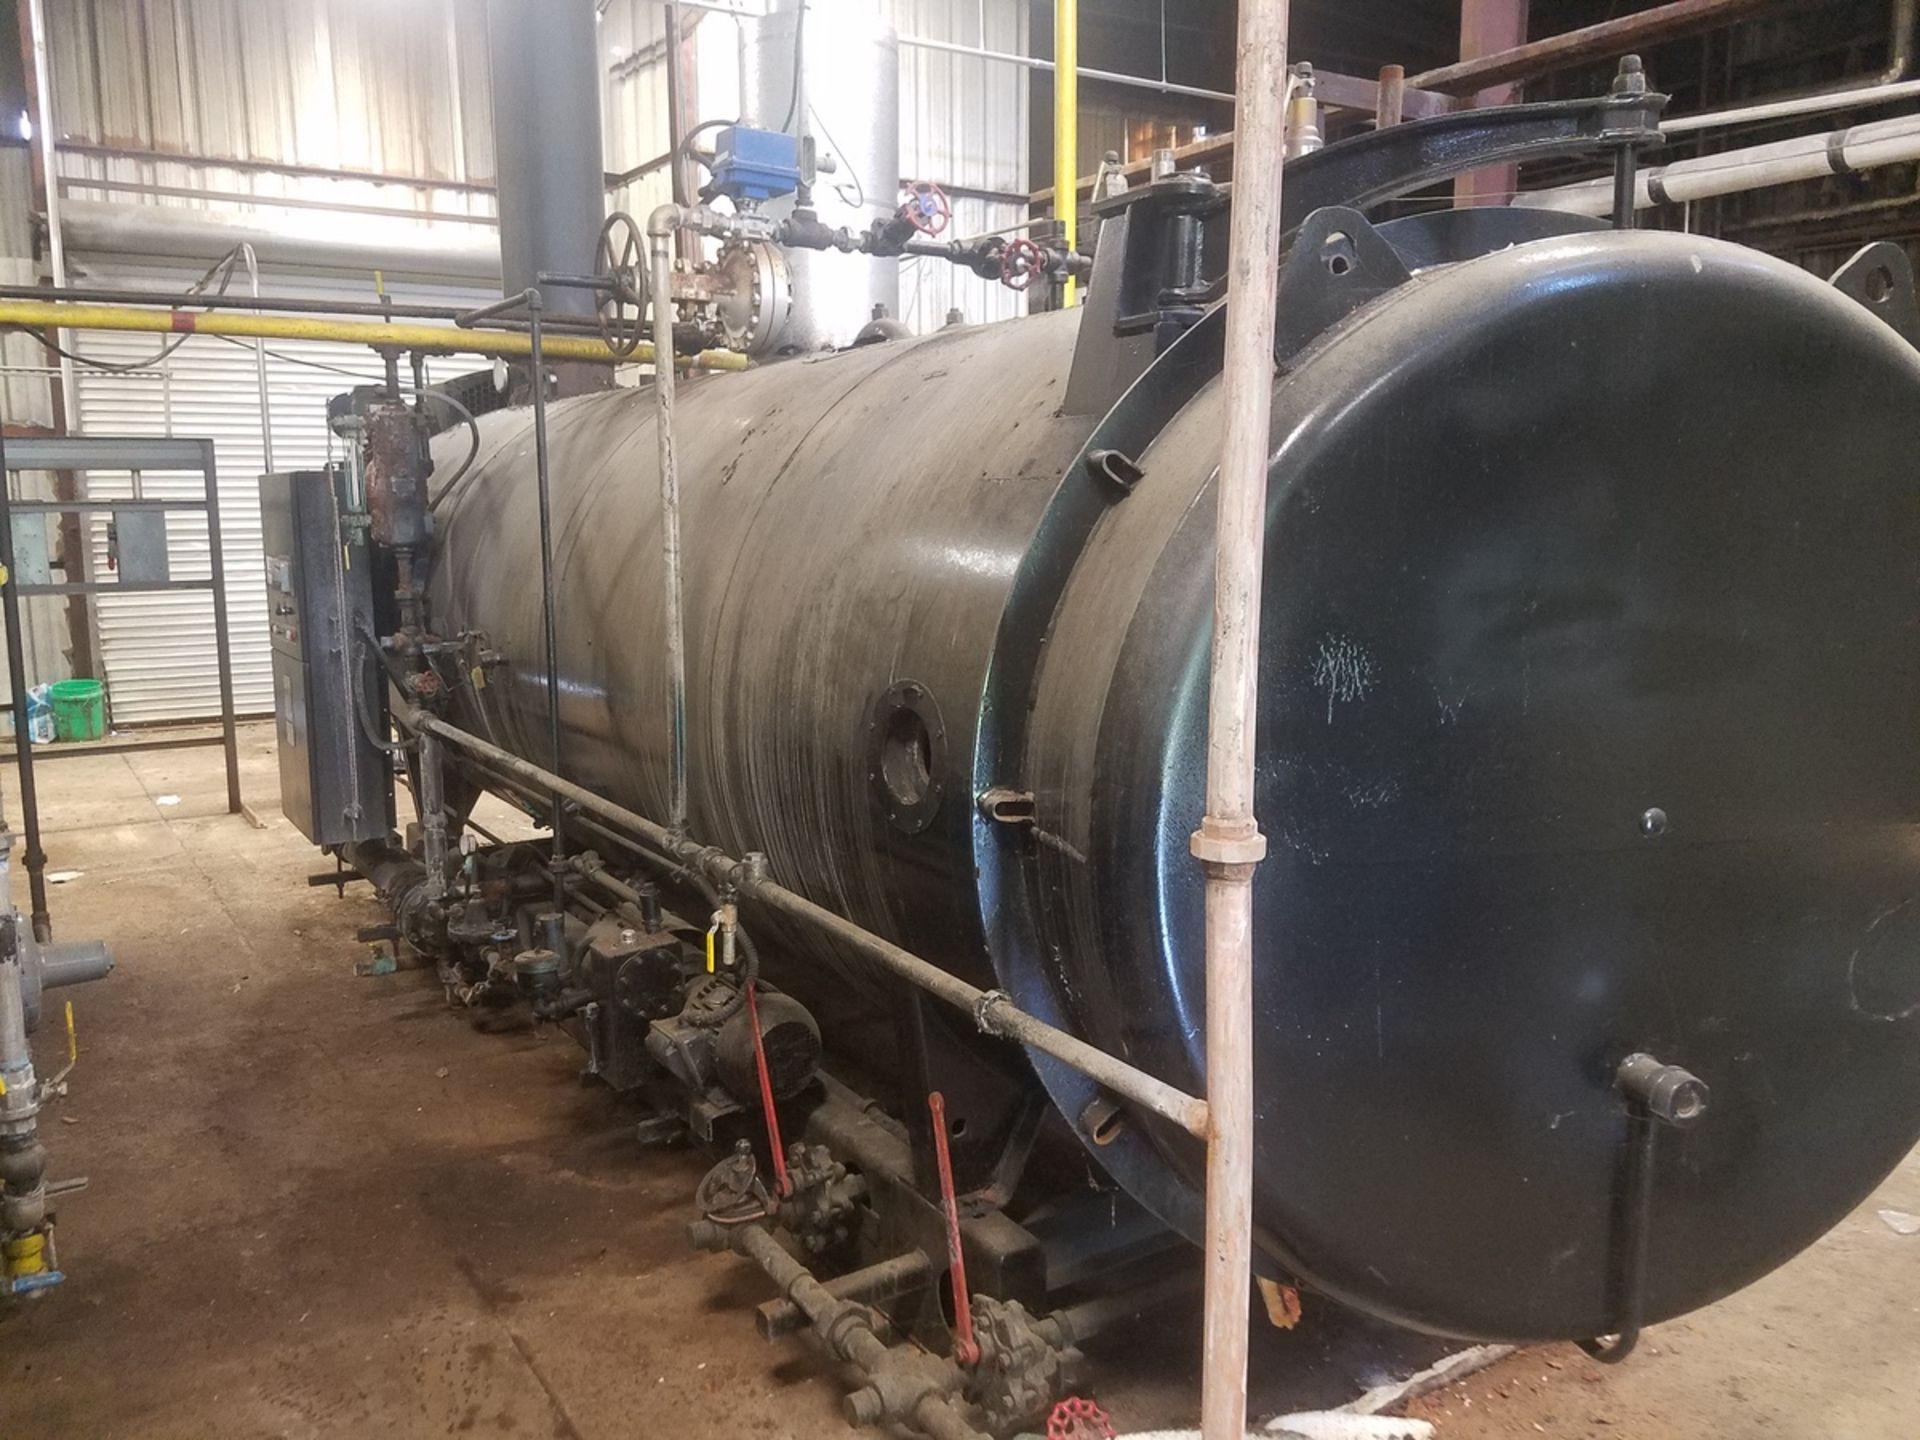 2009 (Rebuilt 2016) 250 HP Cleaver Brooks Boiler, 8.9 mmBTU, M# CB-200-250S-250, | Rig Fee: $5000 - Image 8 of 8